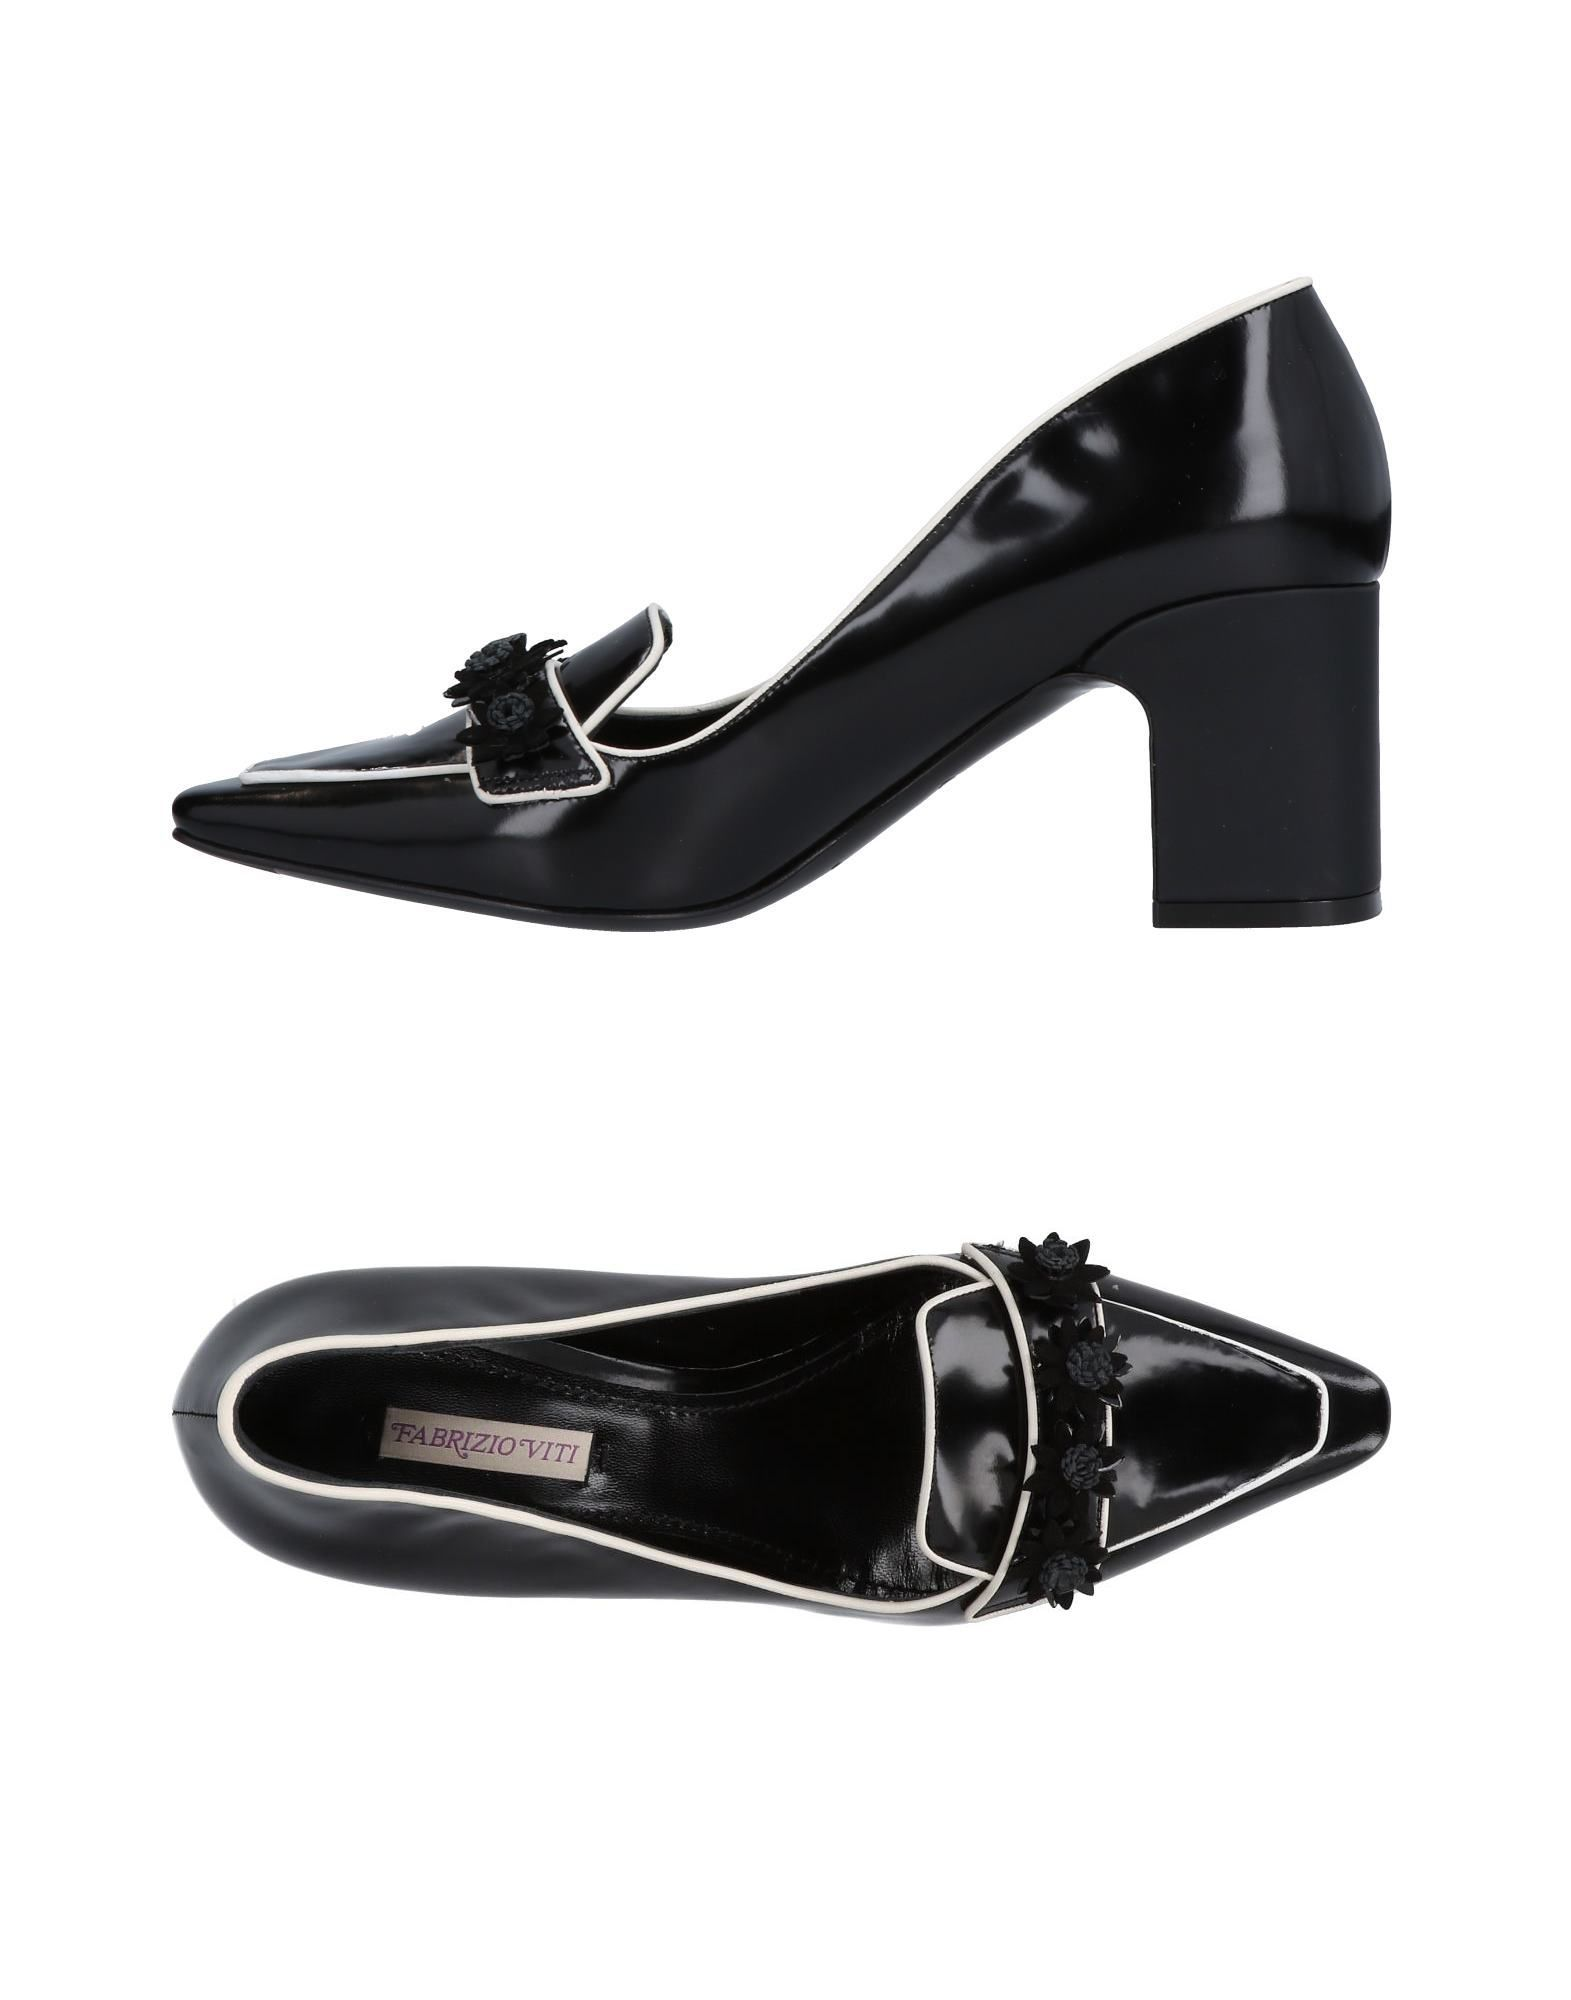 Fabrizio Damen Viti Mokassins Damen Fabrizio  11475376OR Gute Qualität beliebte Schuhe be3e13